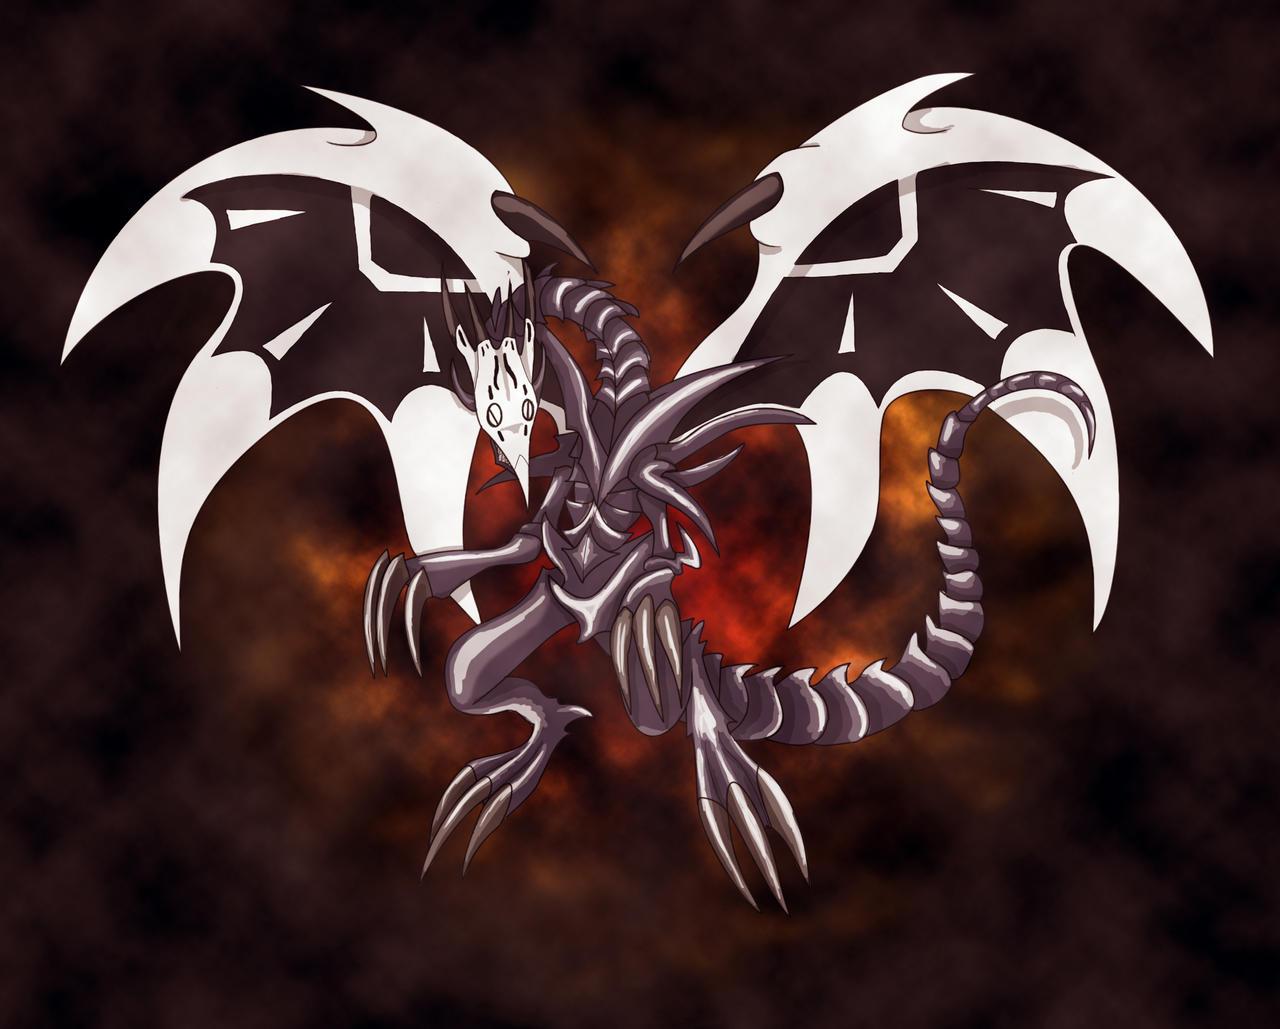 Malefic Red-Eyes Black Dragon by crazedgiggles on DeviantArt